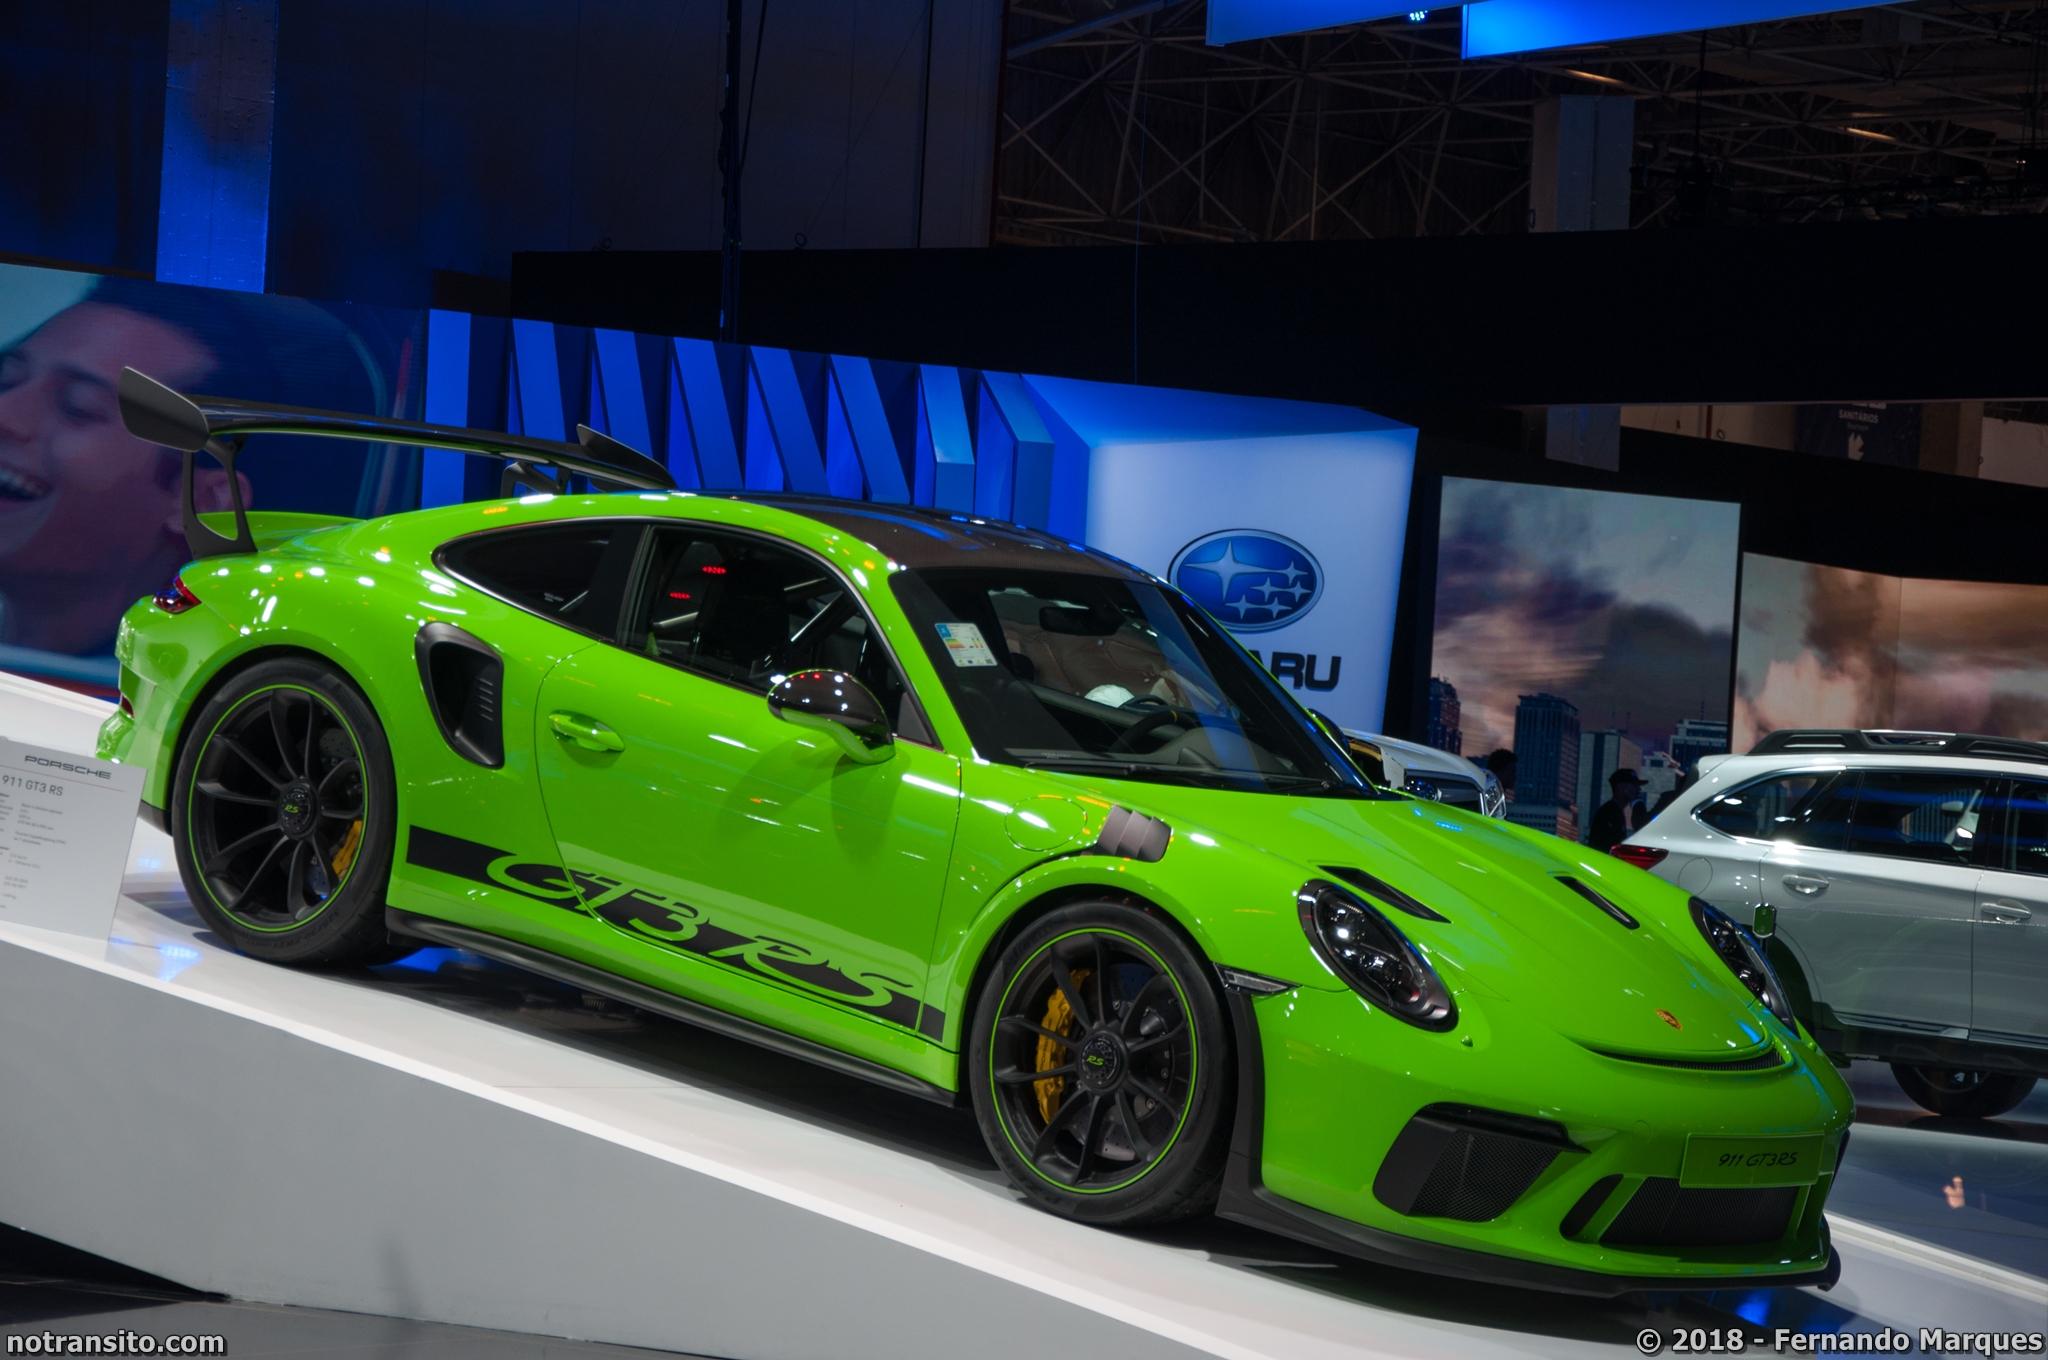 Salão2018-Porsche911GT3RS-02